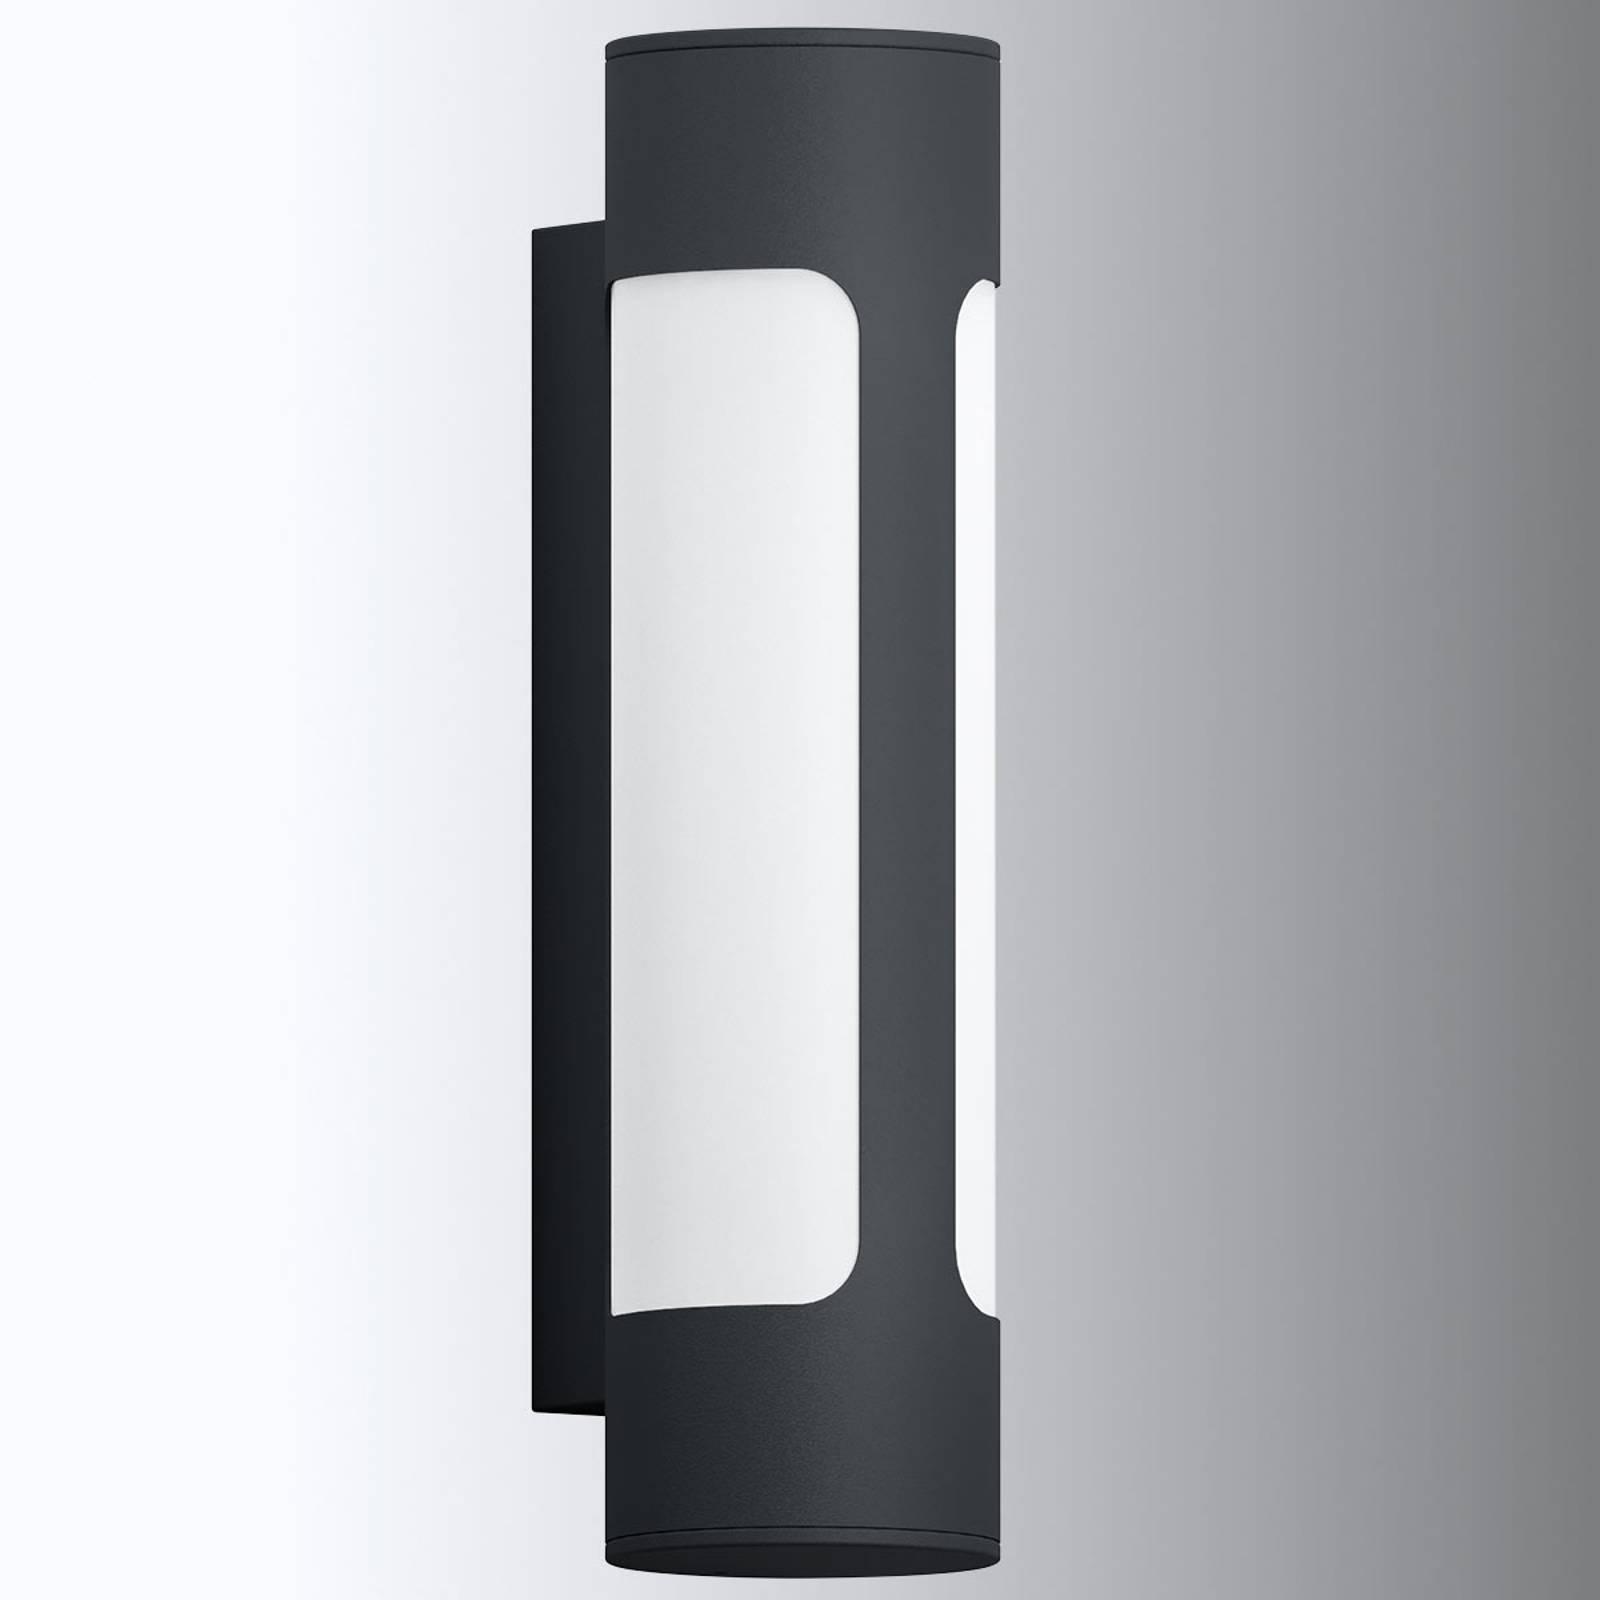 Tonego - LED buitenwandlamp in moderne optiek